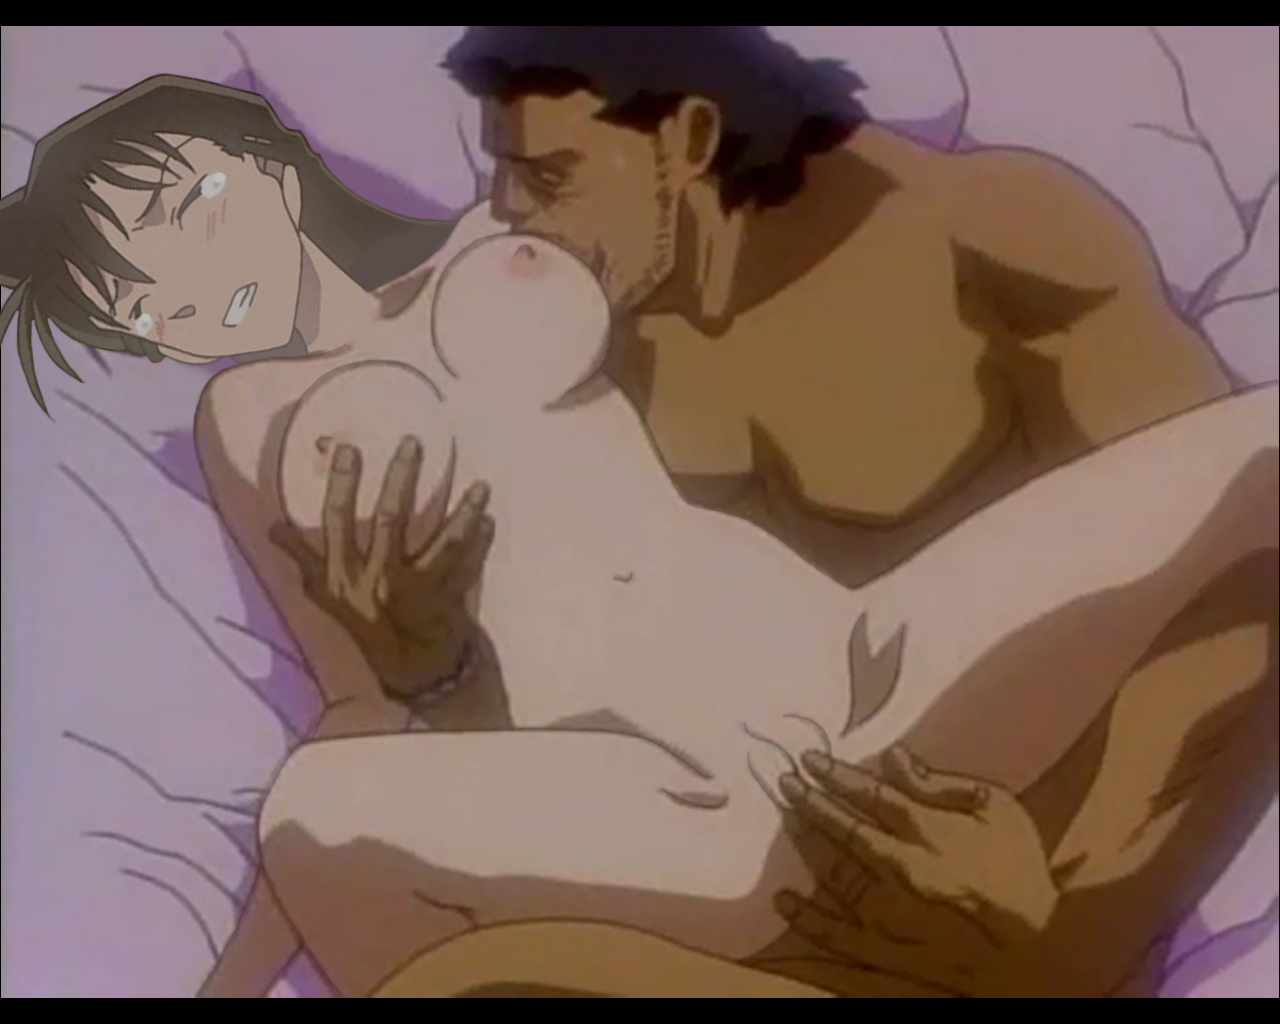 That interestingly Conan hentai sex still that?